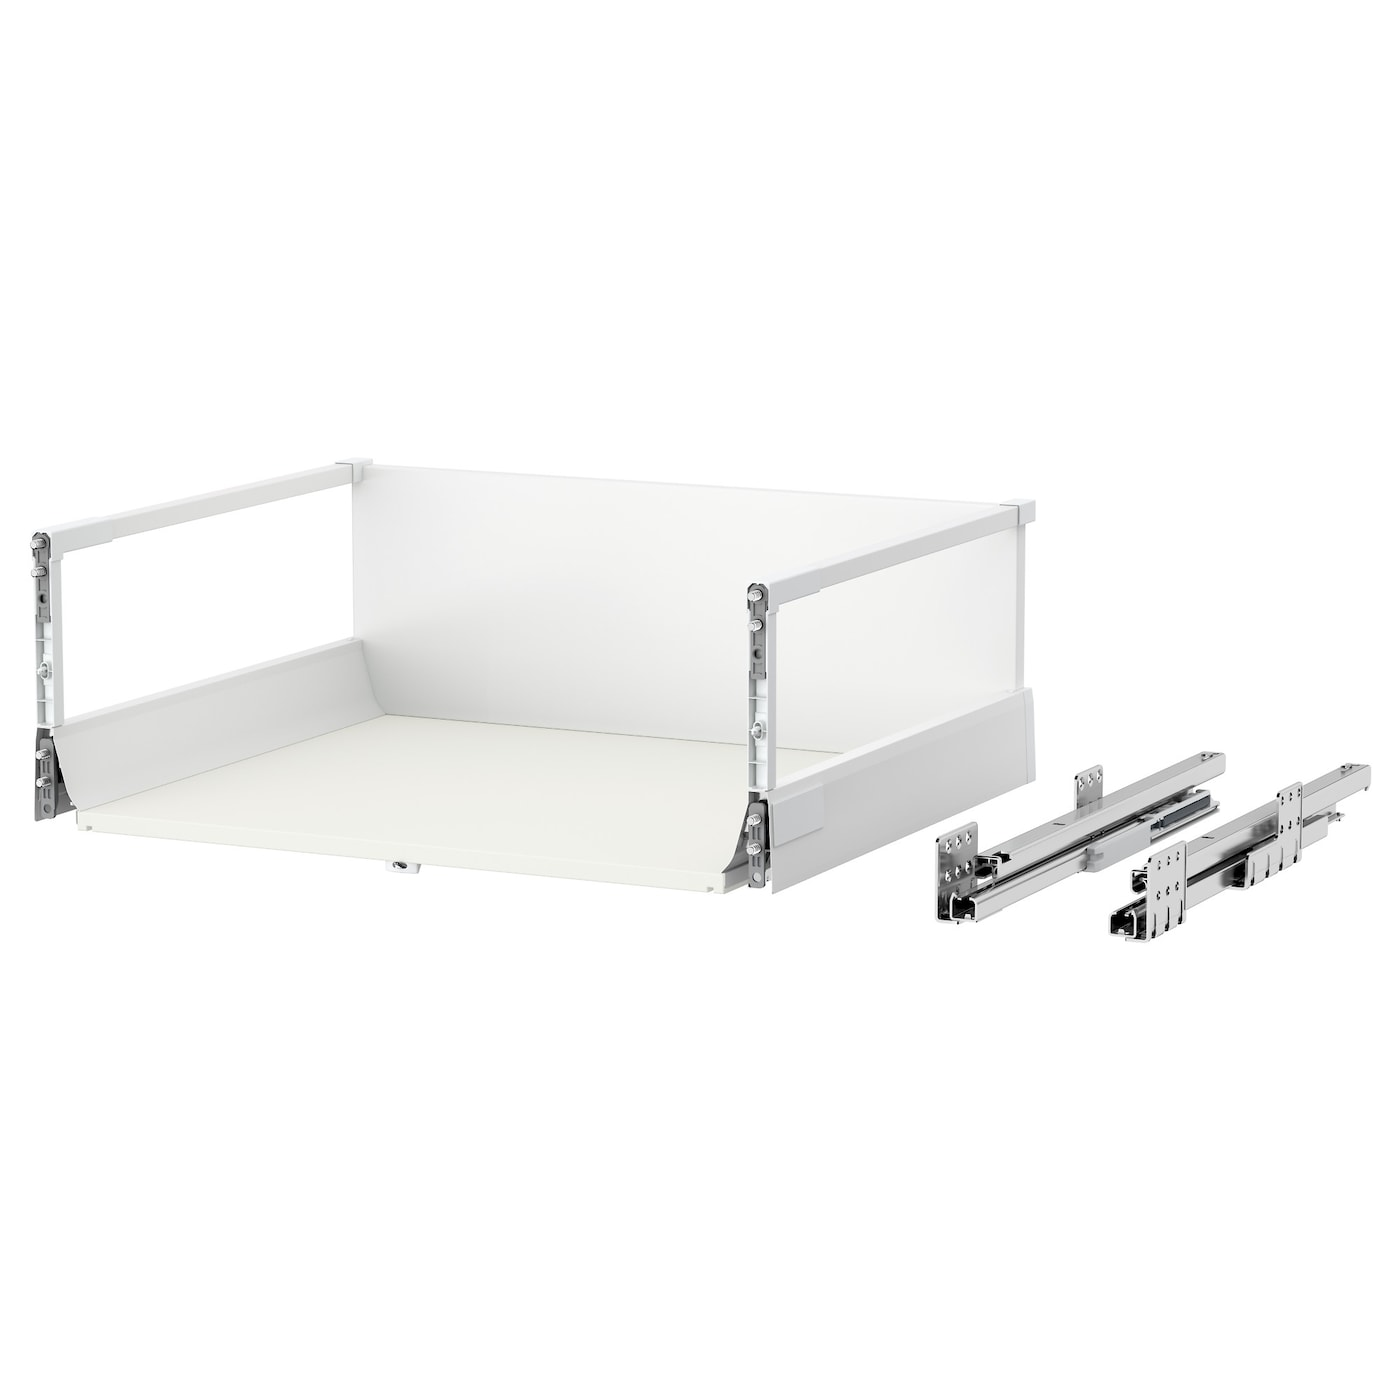 maximera tiroir haut blanc 60x45 cm ikea. Black Bedroom Furniture Sets. Home Design Ideas